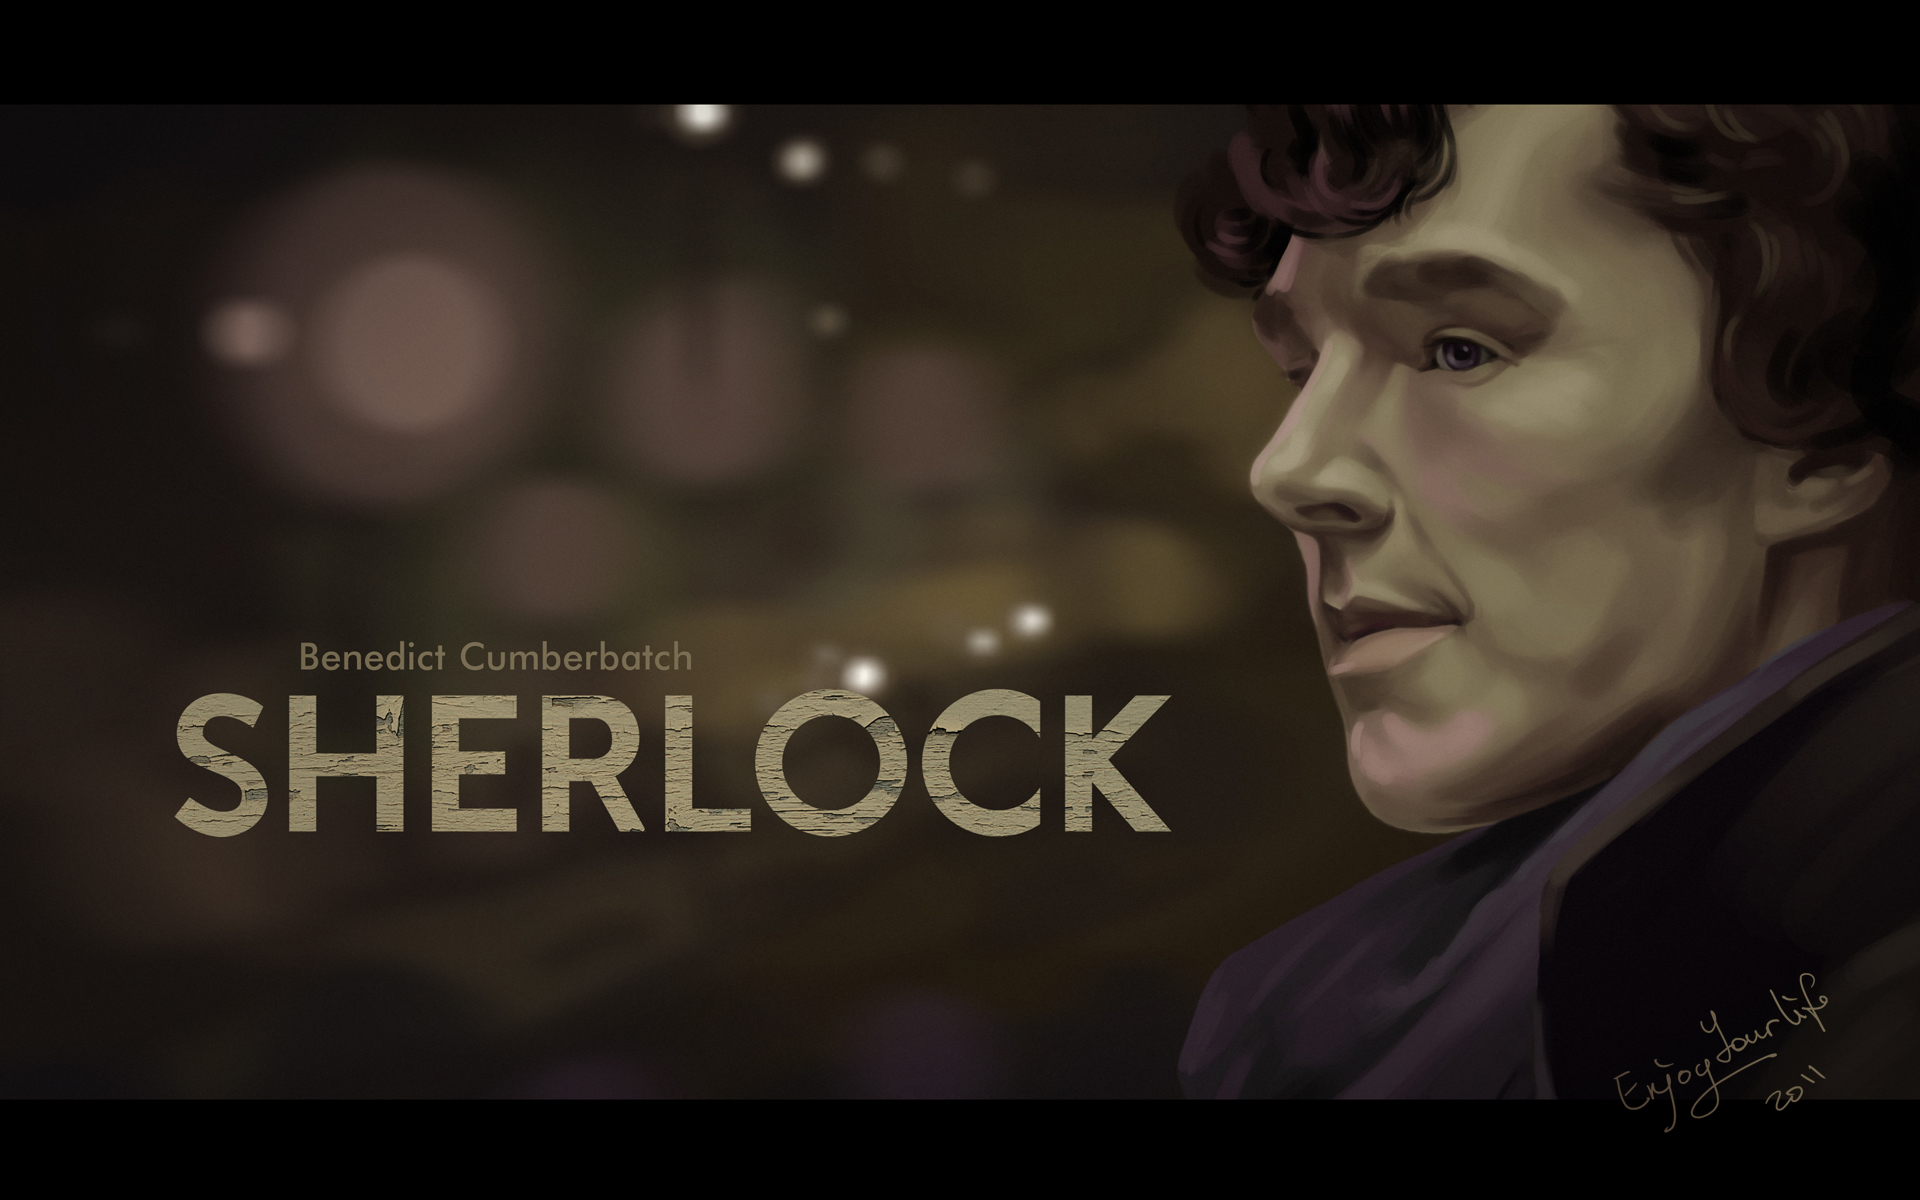 sherlock tv series wallpaper - photo #18